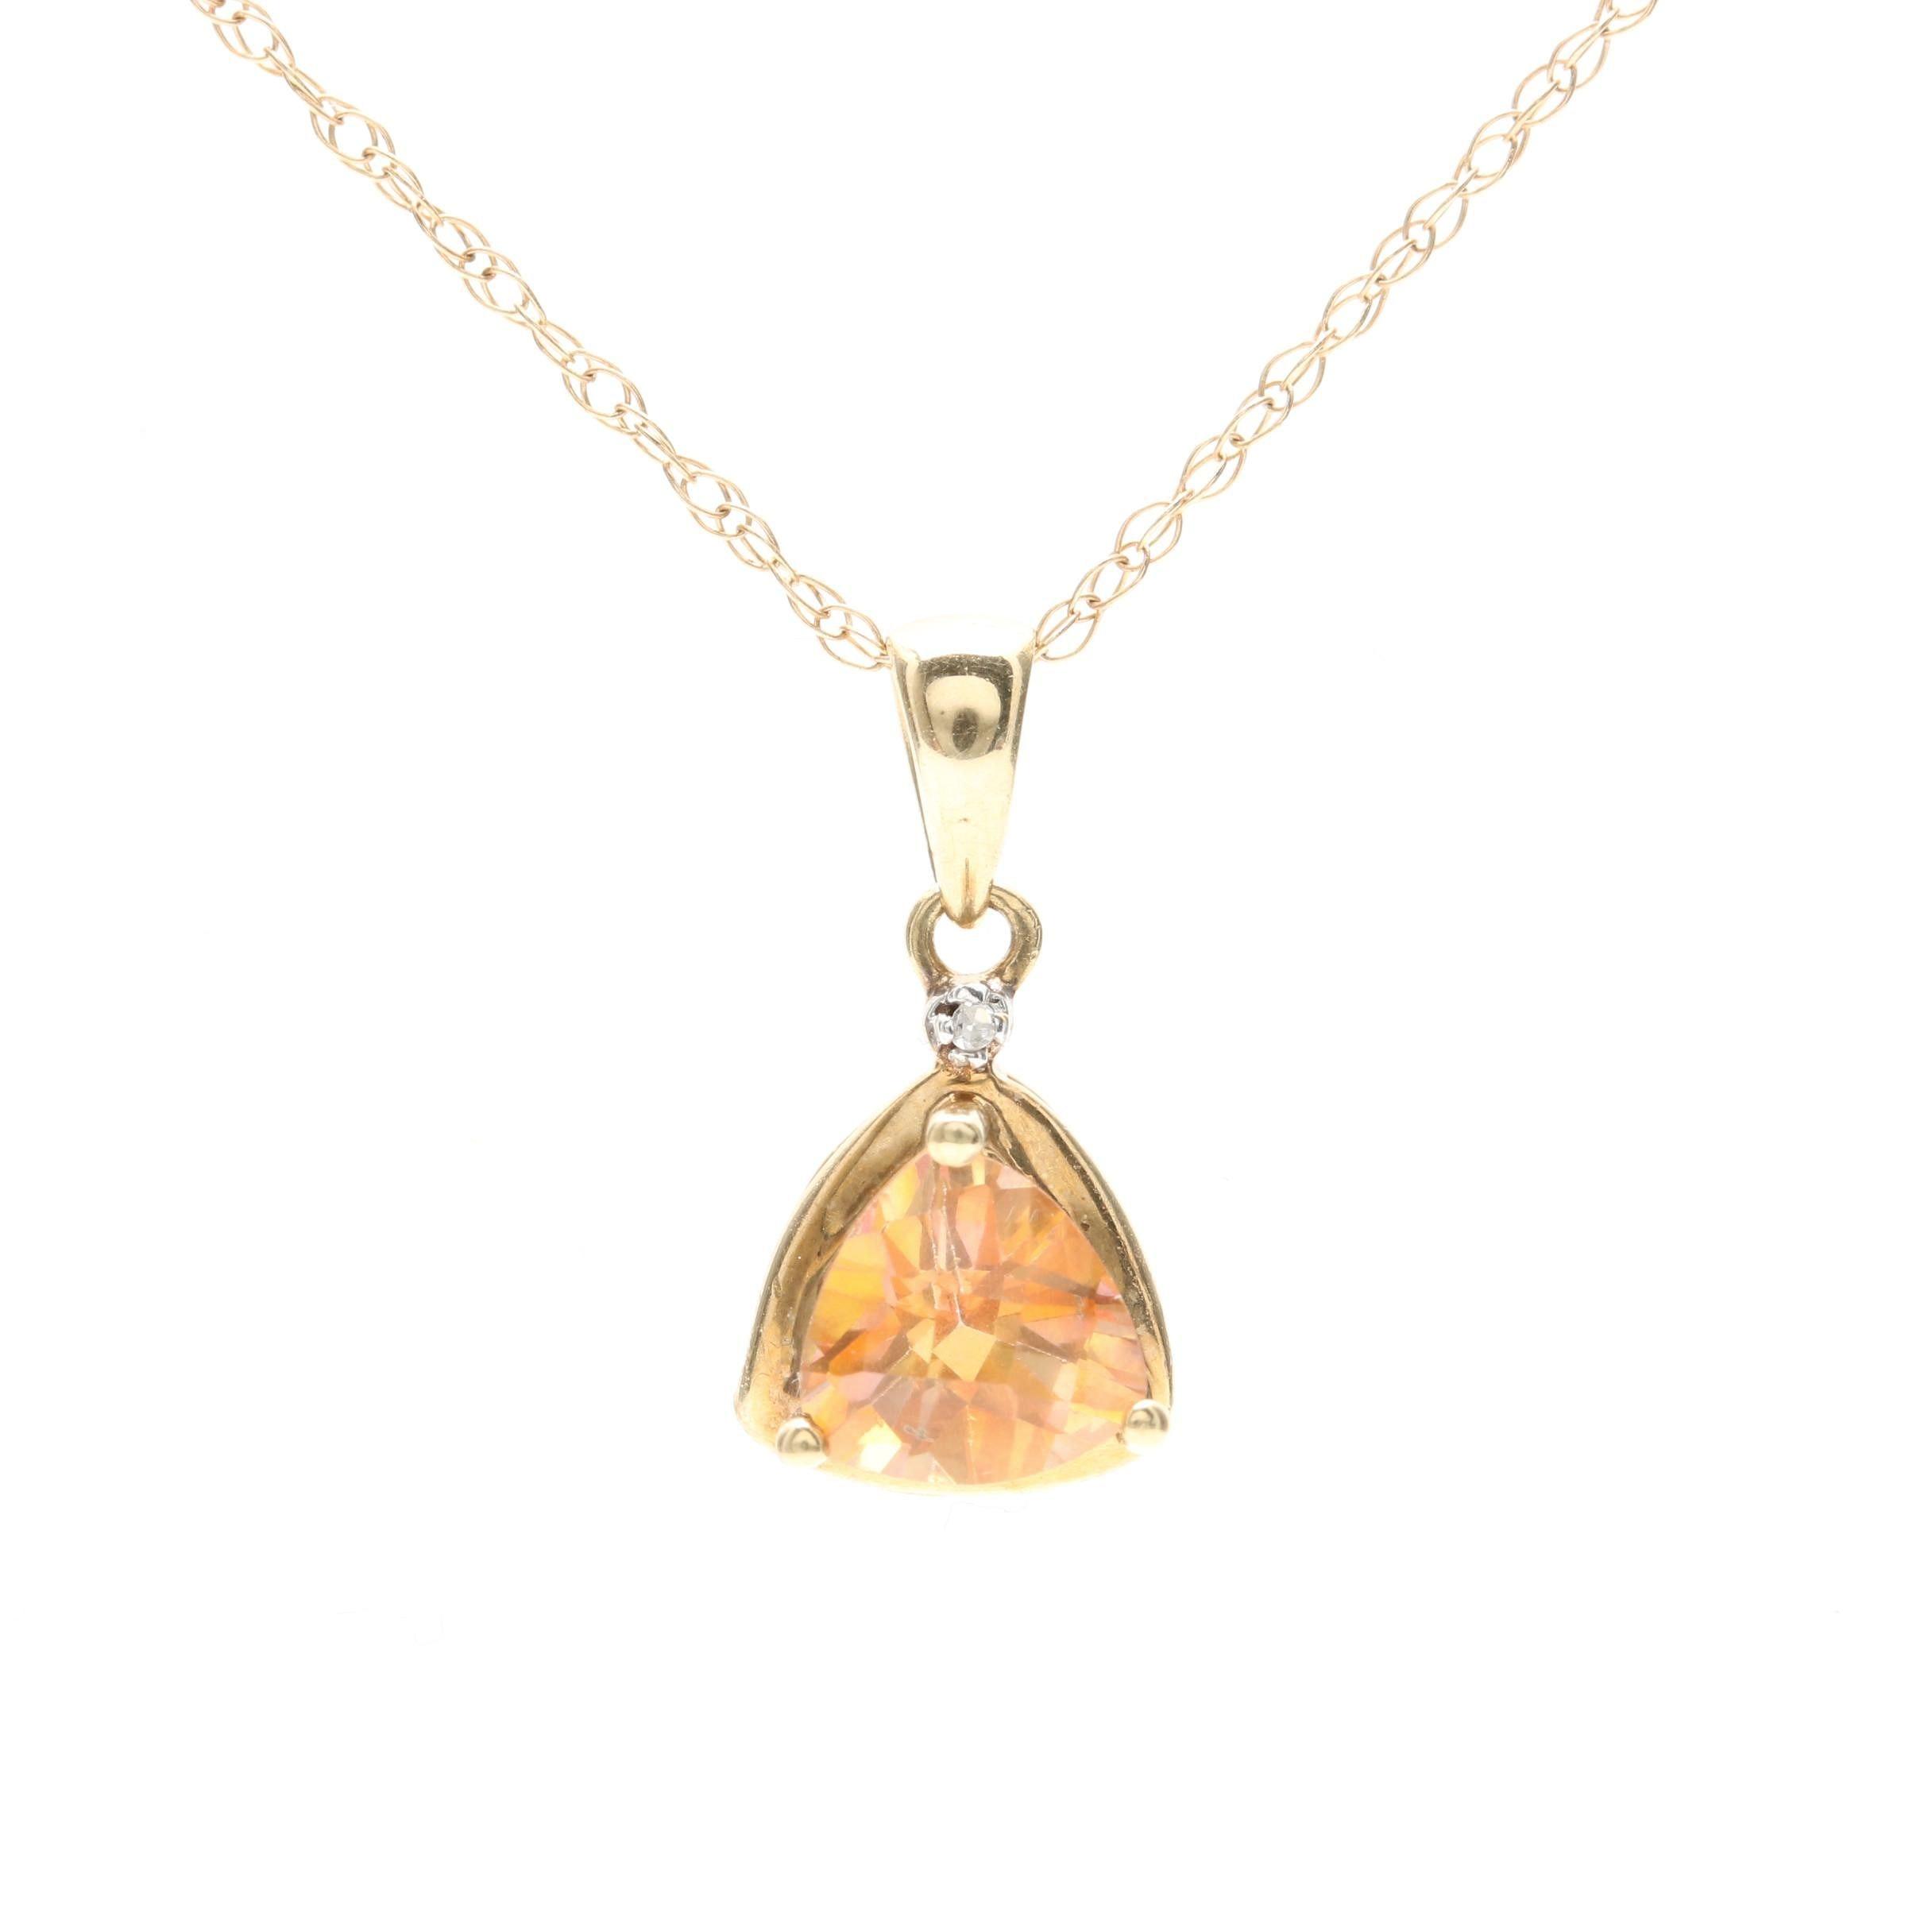 10K Yellow Gold Topaz and Diamond Pendant Necklace